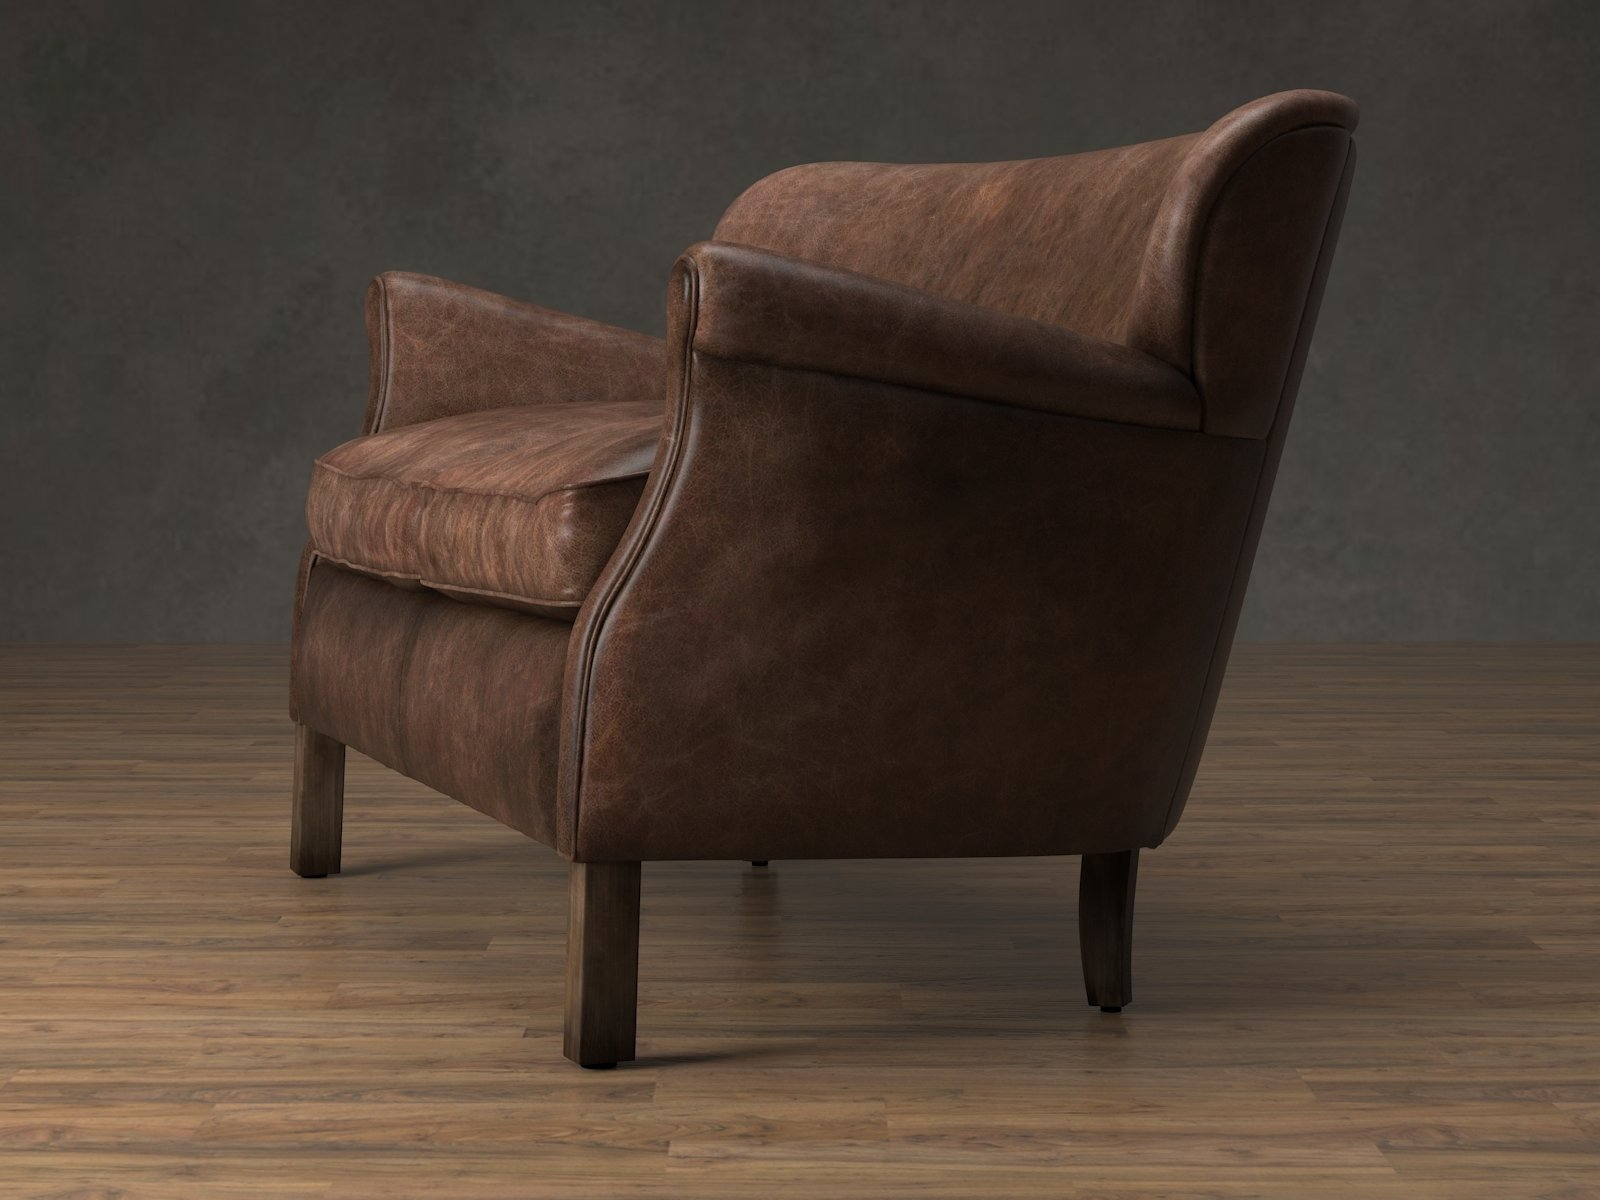 professor chair restoration hardware serta arlington review 39s leather double 3d modell